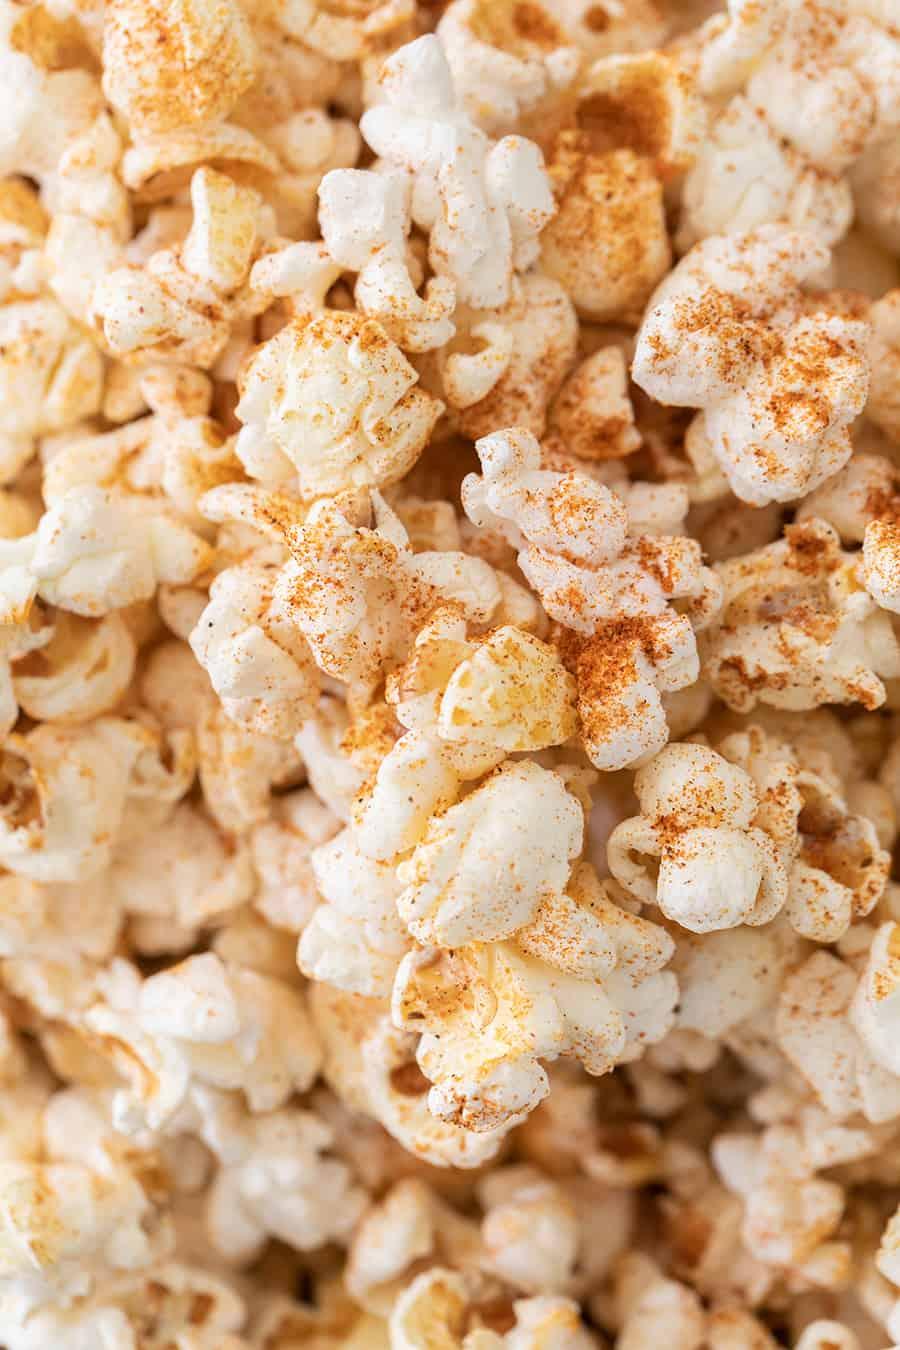 Old Bay Seasoning on Popcorn